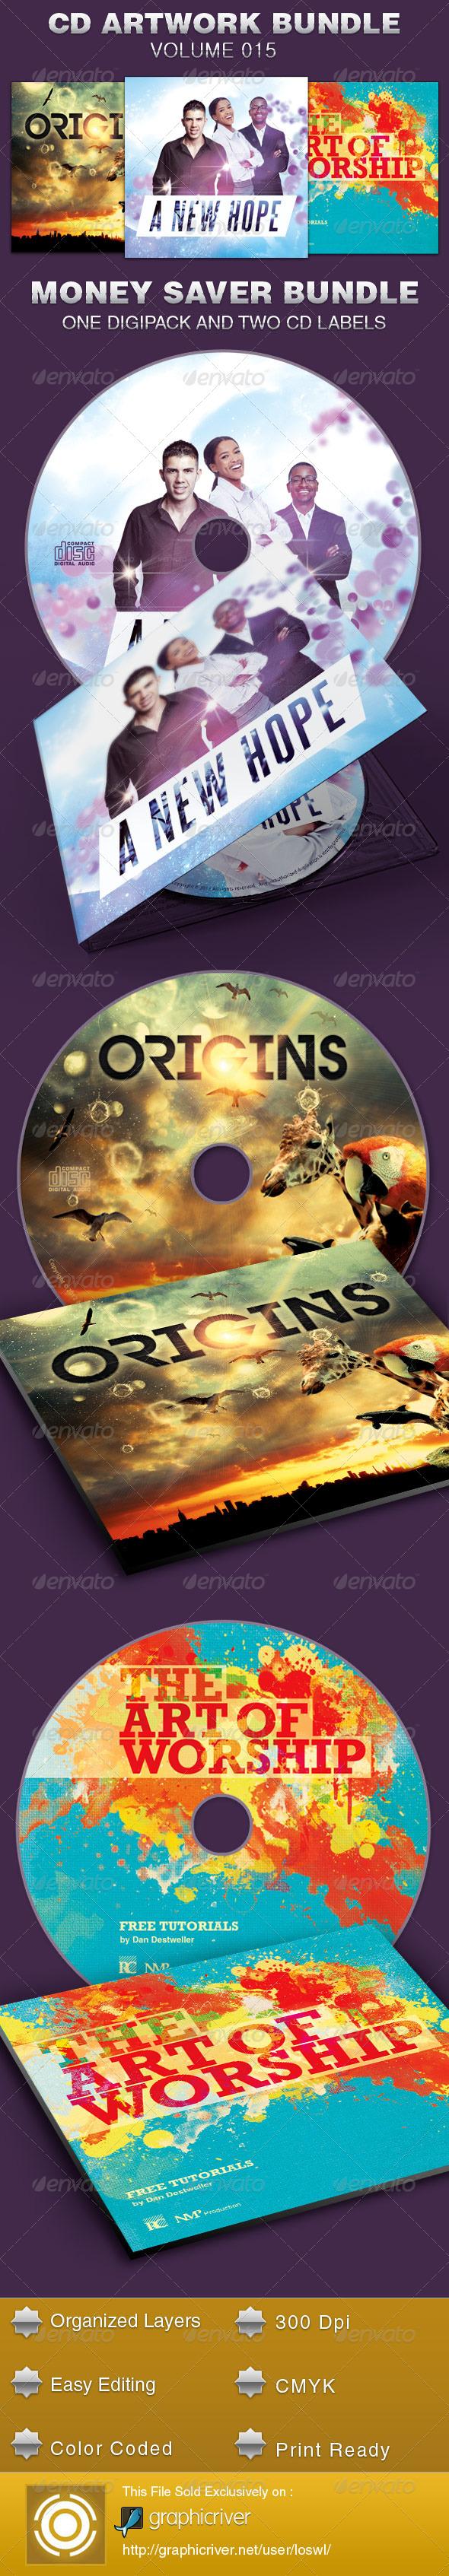 CD Cover Artwork Template Bundle-Vol 015 - CD & DVD Artwork Print Templates